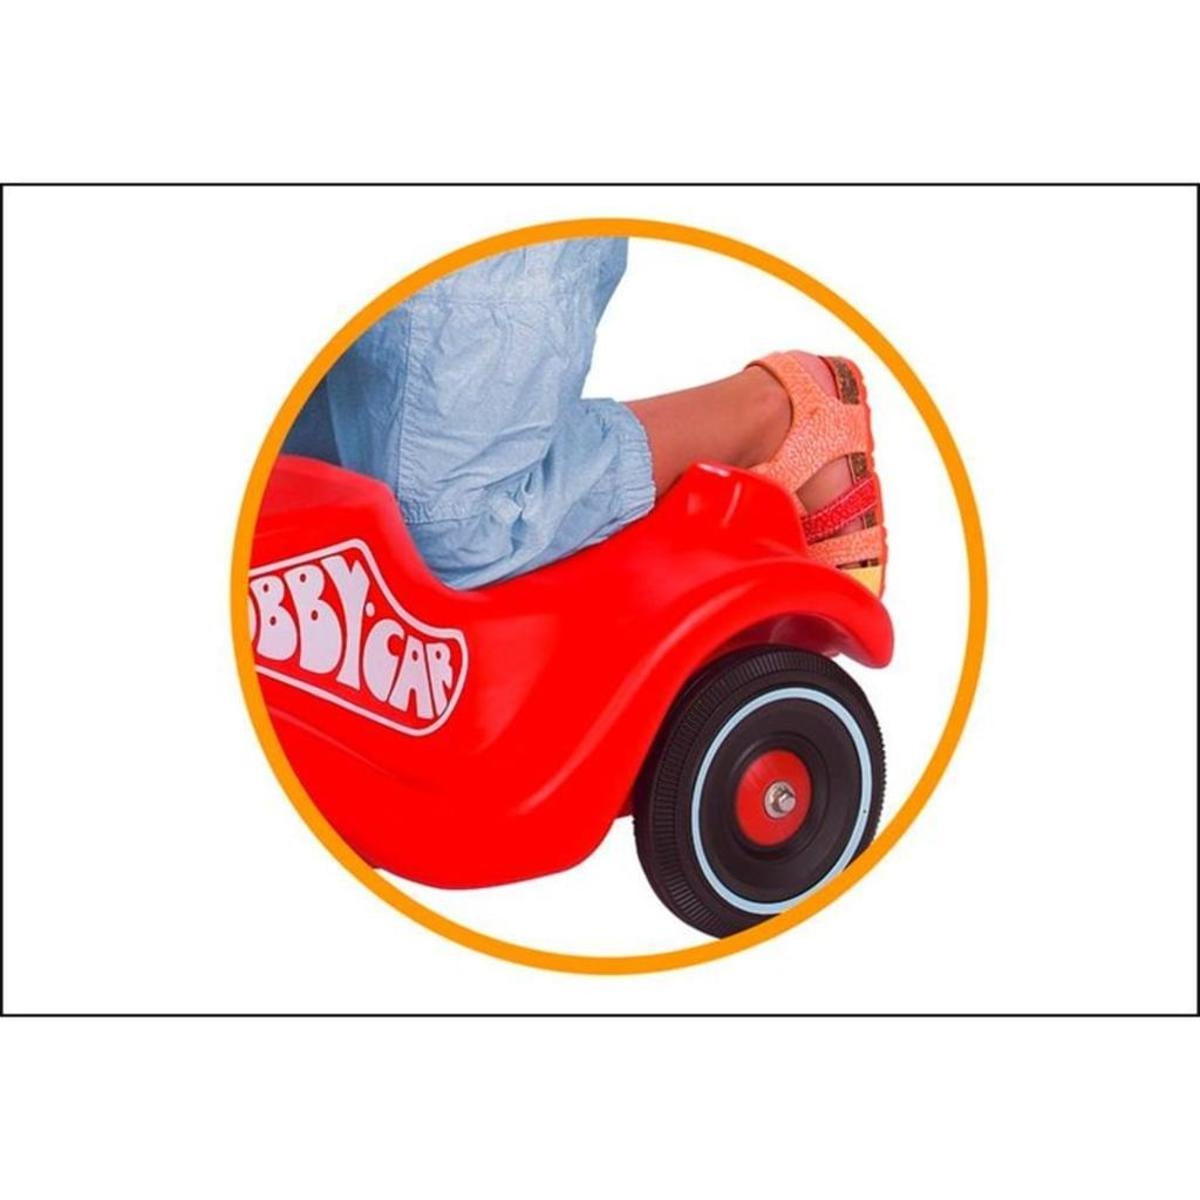 Bild 5 von Big-Bobby-Car-Classic, rot